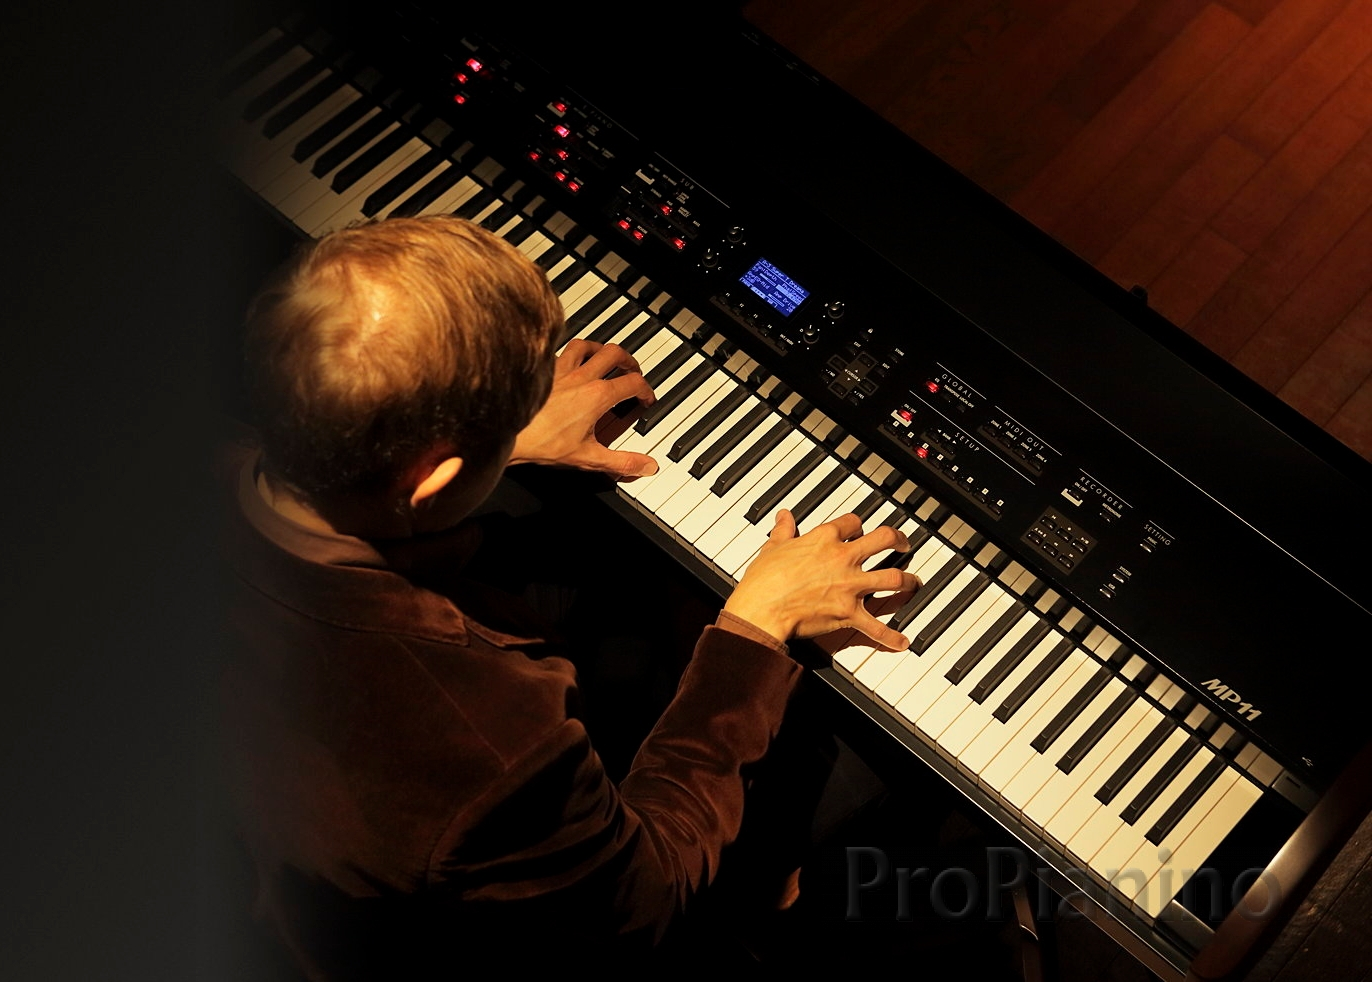 Цифровое пианино Kawai MP11 для профессионалов